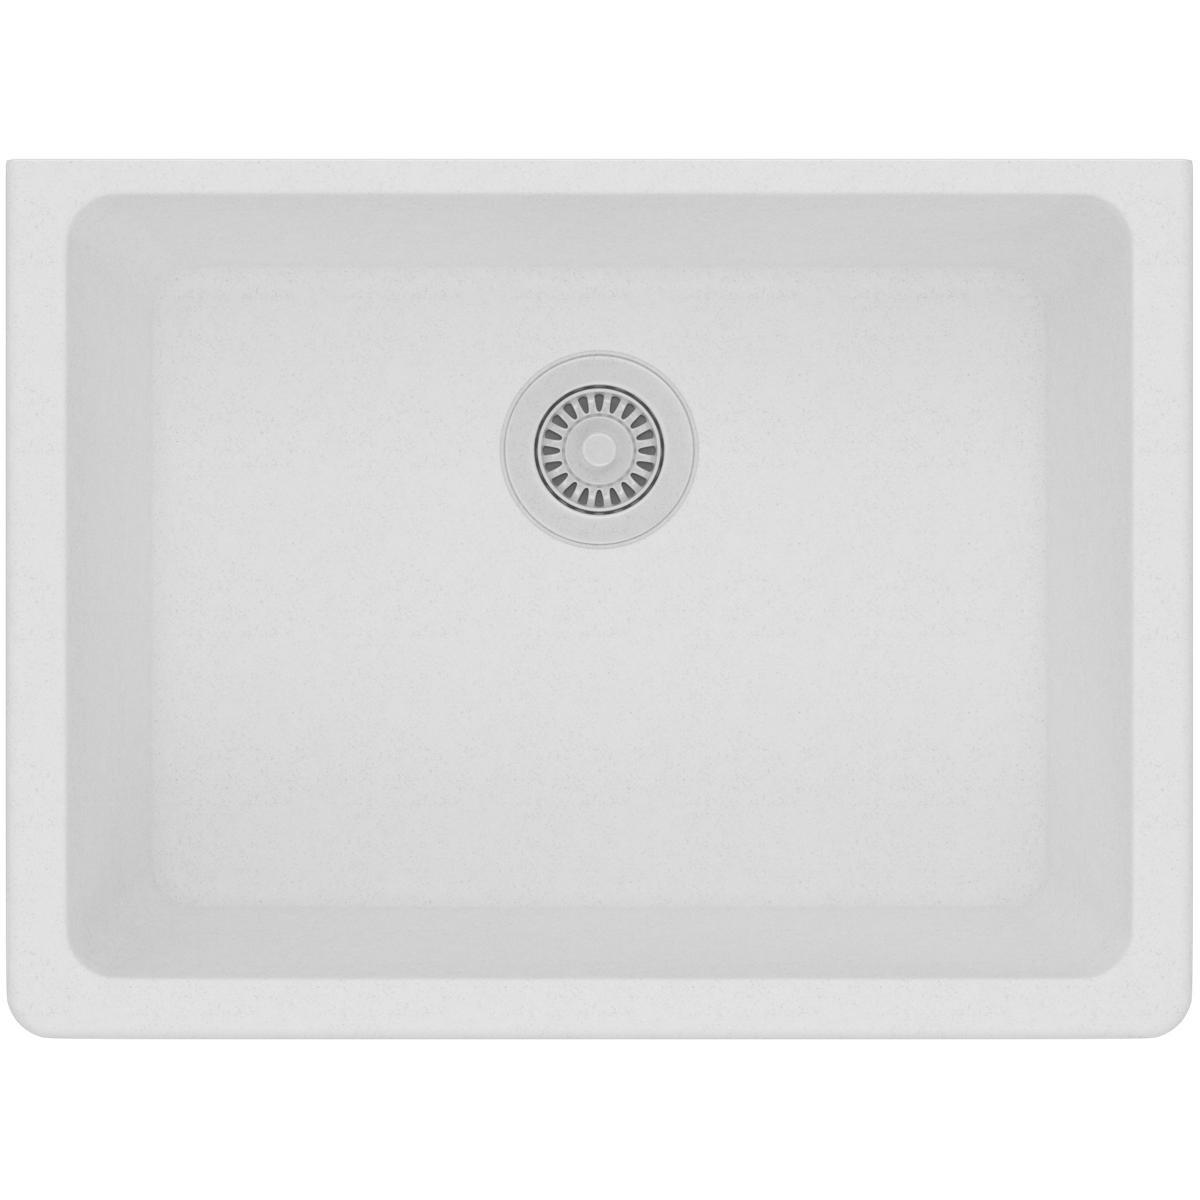 Elkay Quartz Classic ELGU2522WH0 Single Bowl Undermount Sink, White by Elkay (Image #1)